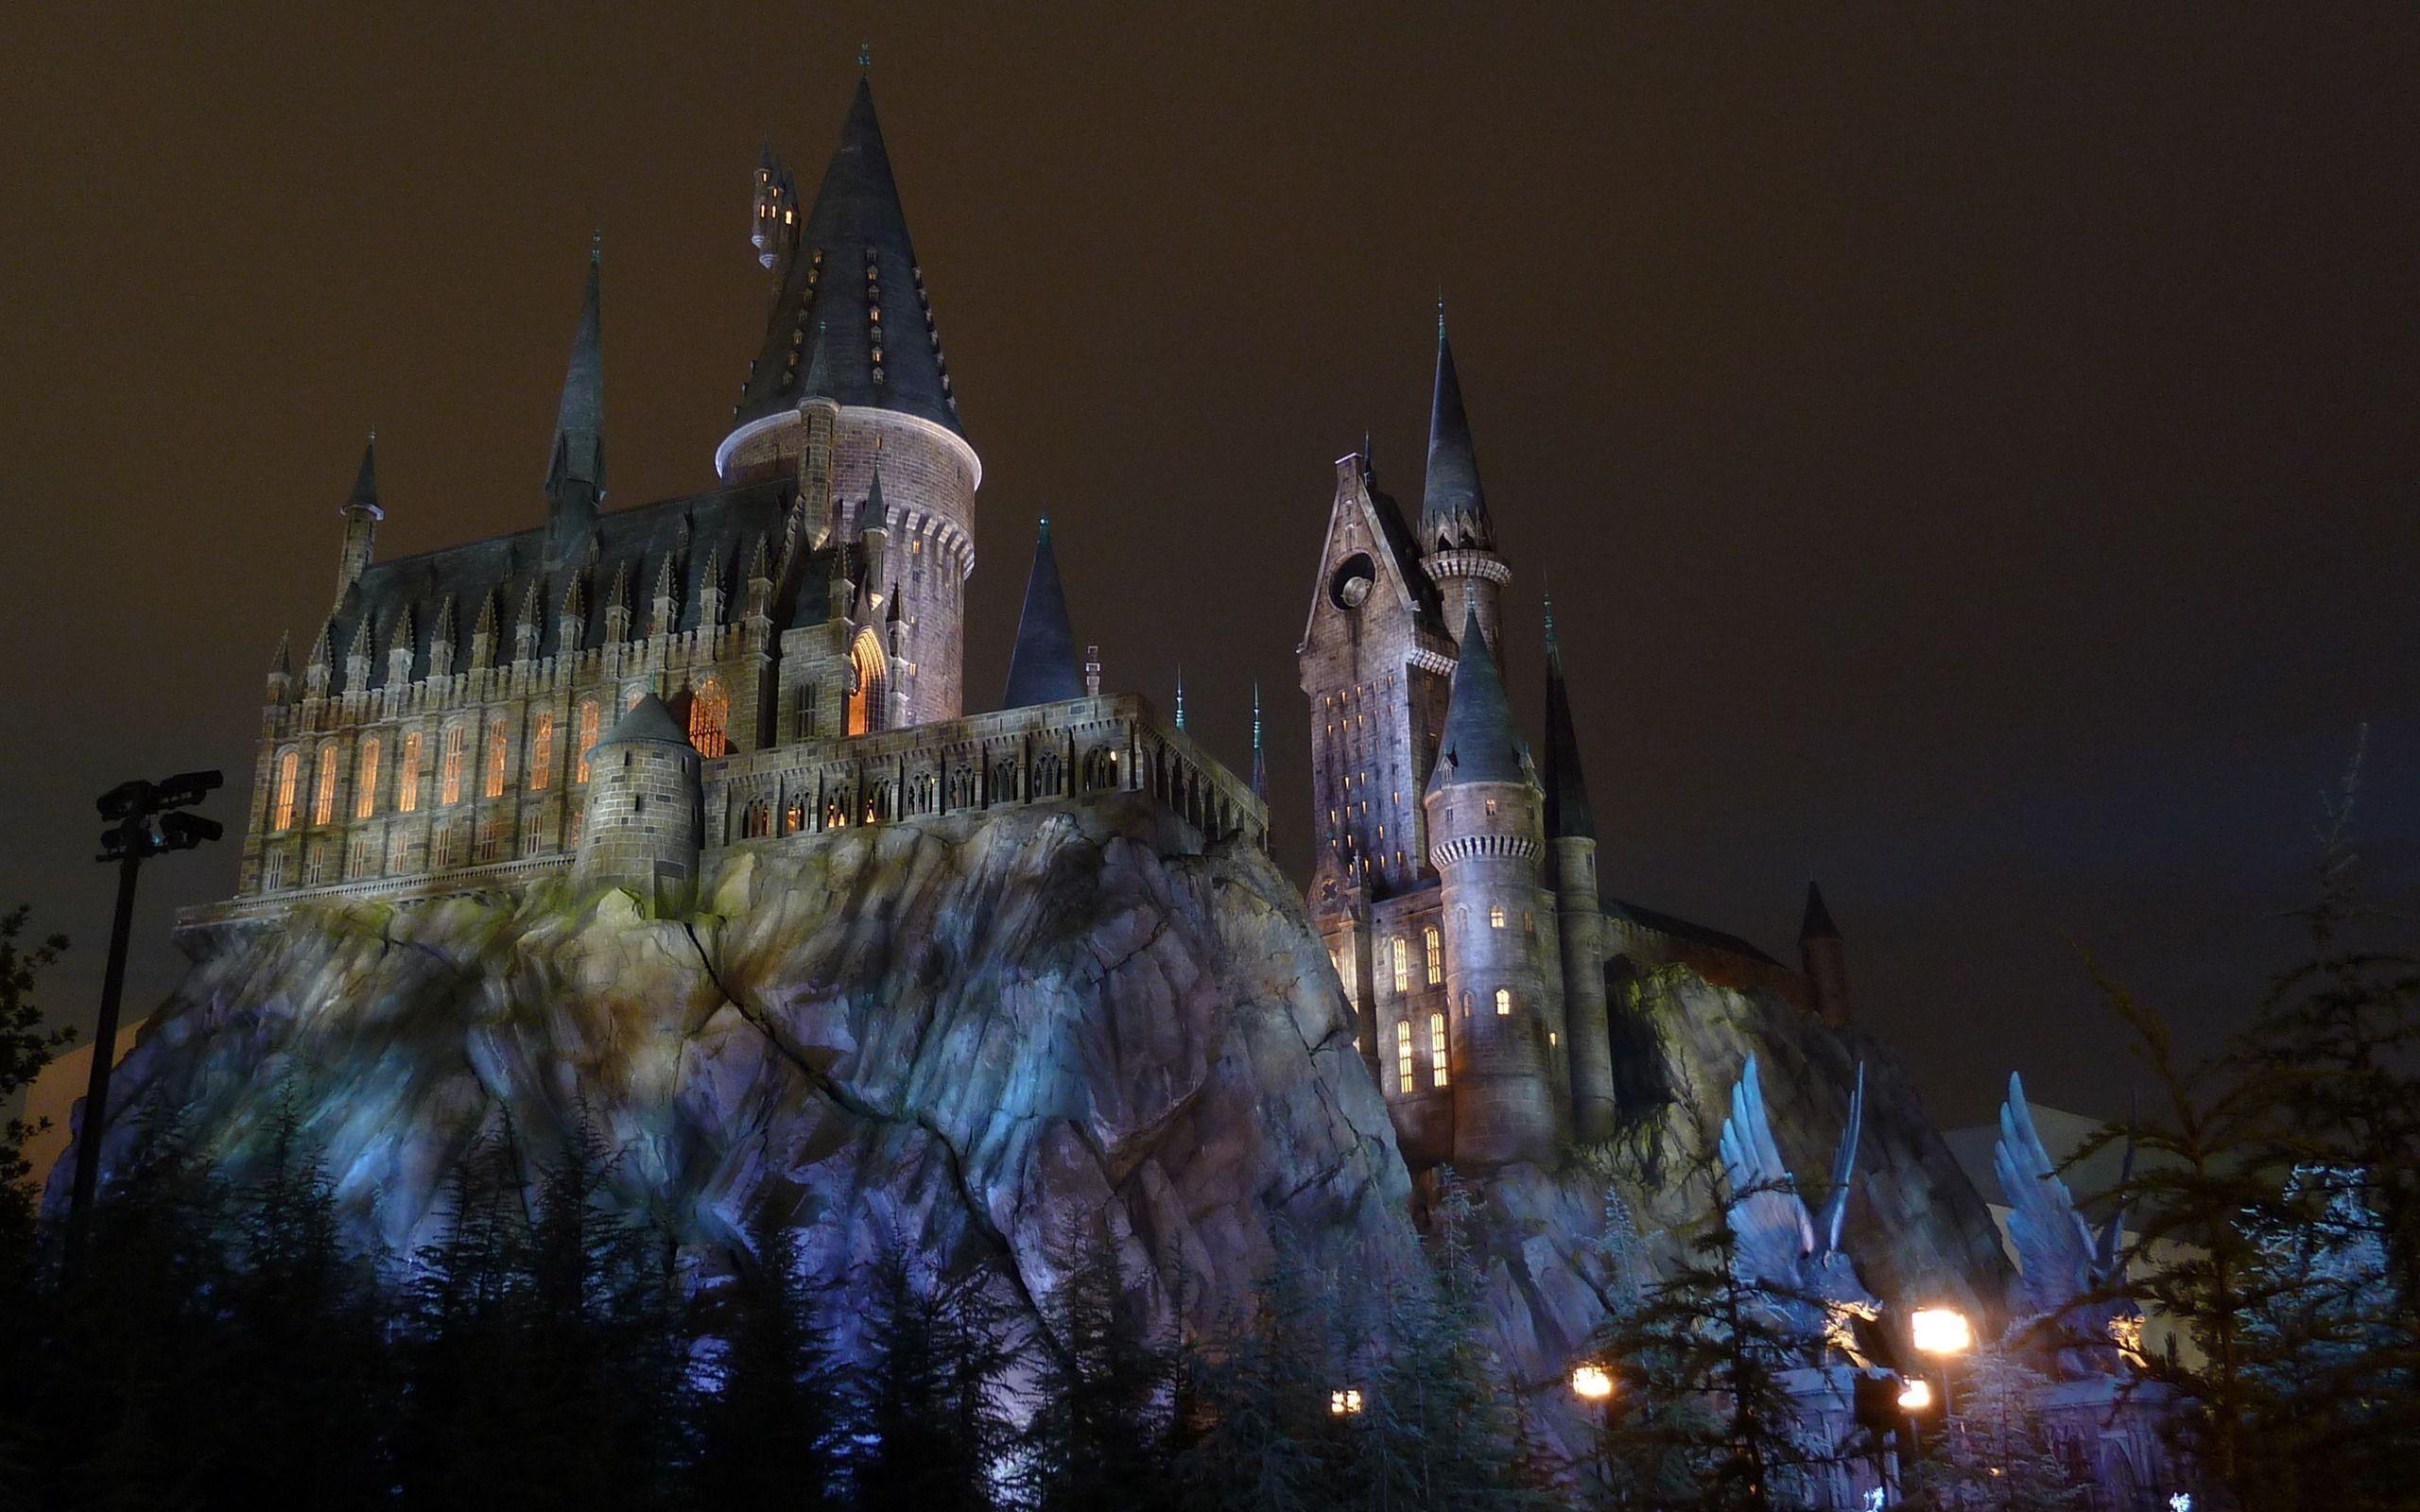 Harry Potter Christmas Wallpaper Hd.Winter Castle Wallpaper 66 Images